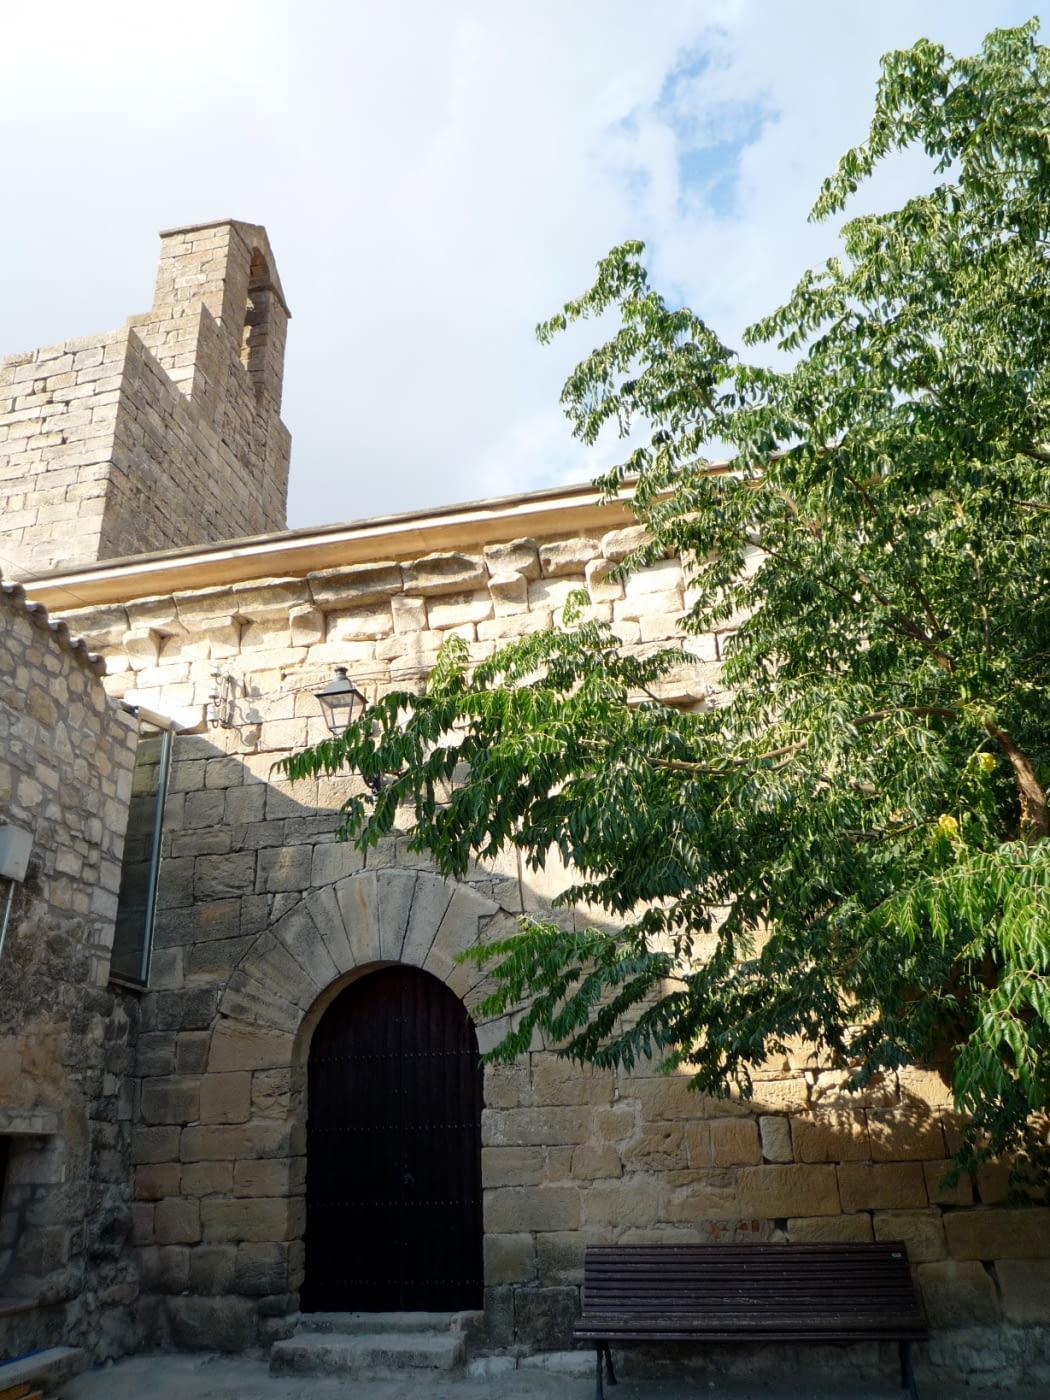 Dissabte 18 de setembre, Visita sostenible pel nucli de Montblanquet